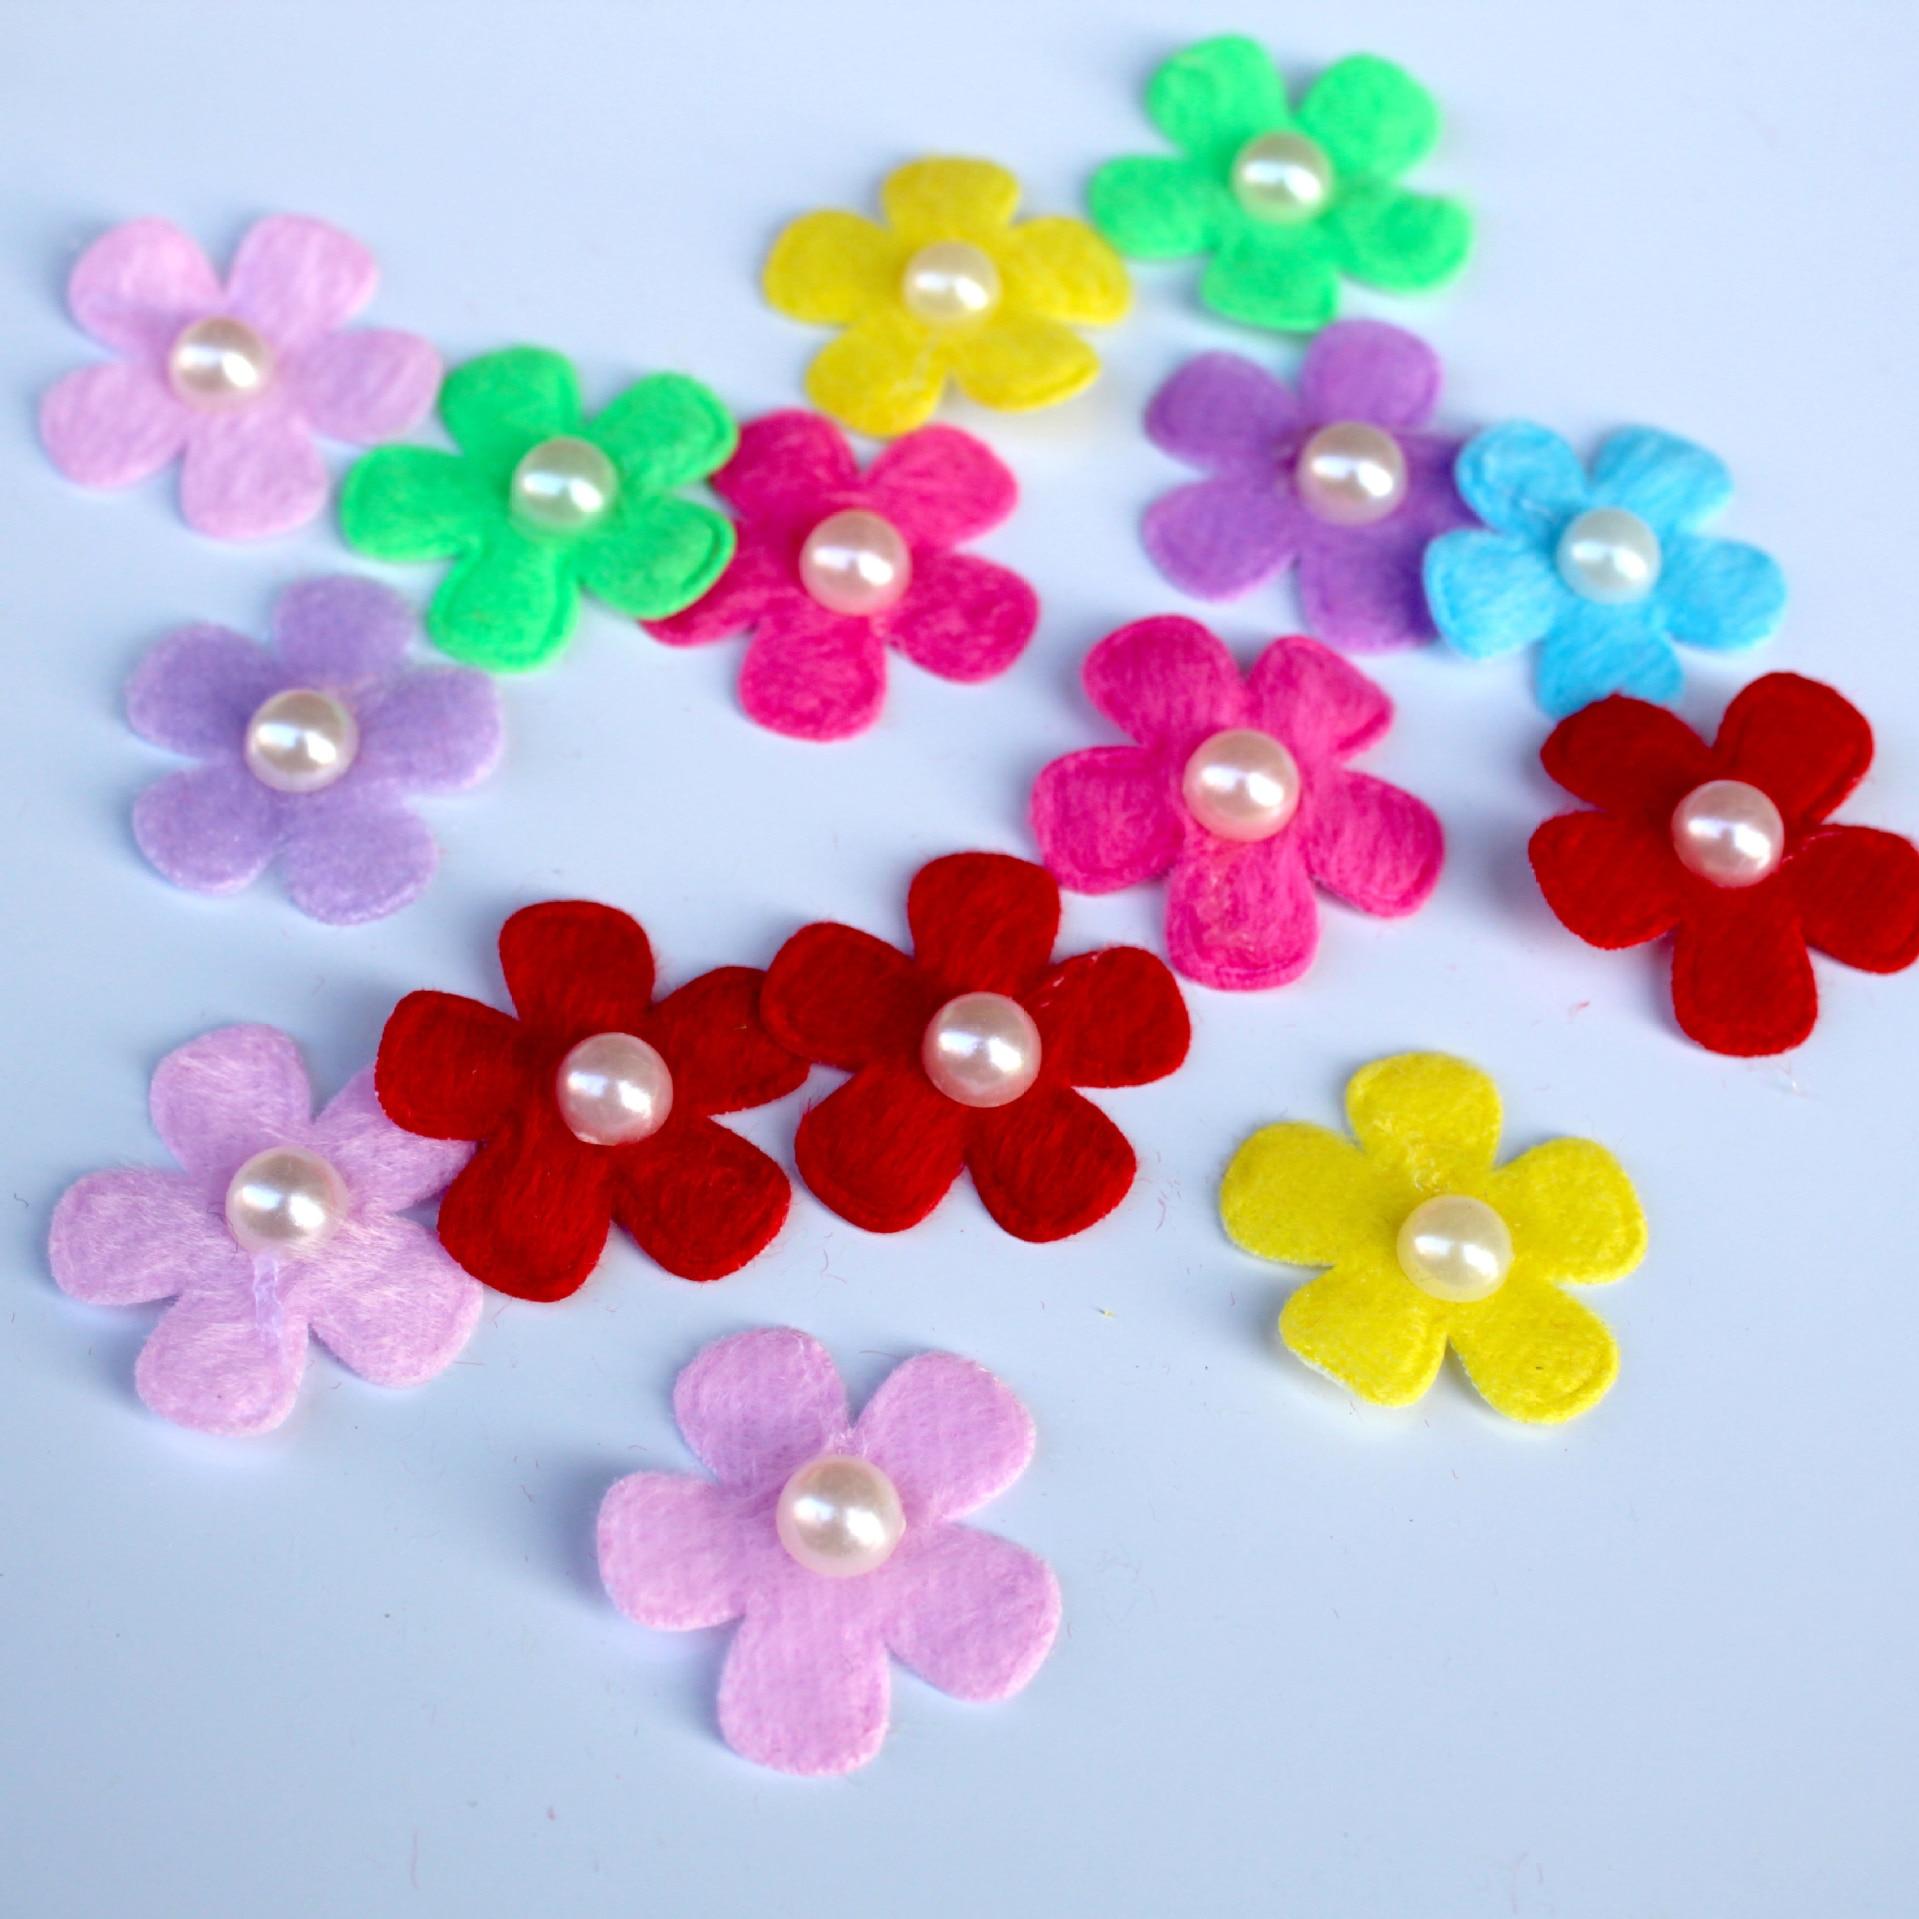 T-N 100PCS Bunte Perle Handgemachte Perle Blume Fühlte Tuch Haar Seil DIY Handgemachte Accessoires Aufkleber Applique Patches Filz Pads